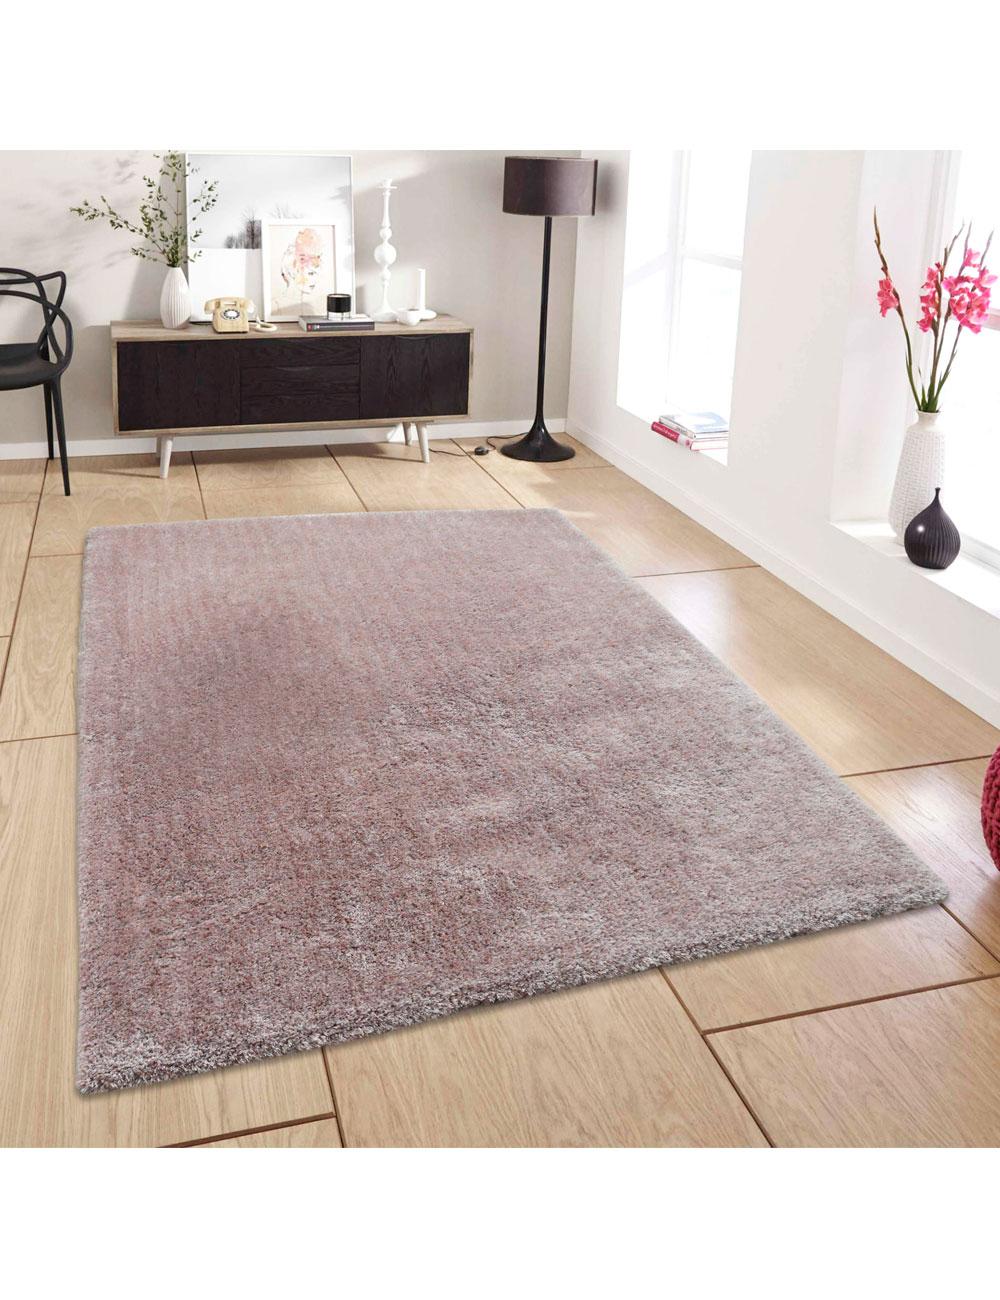 teppich mady lila 160 x 230 cm. Black Bedroom Furniture Sets. Home Design Ideas